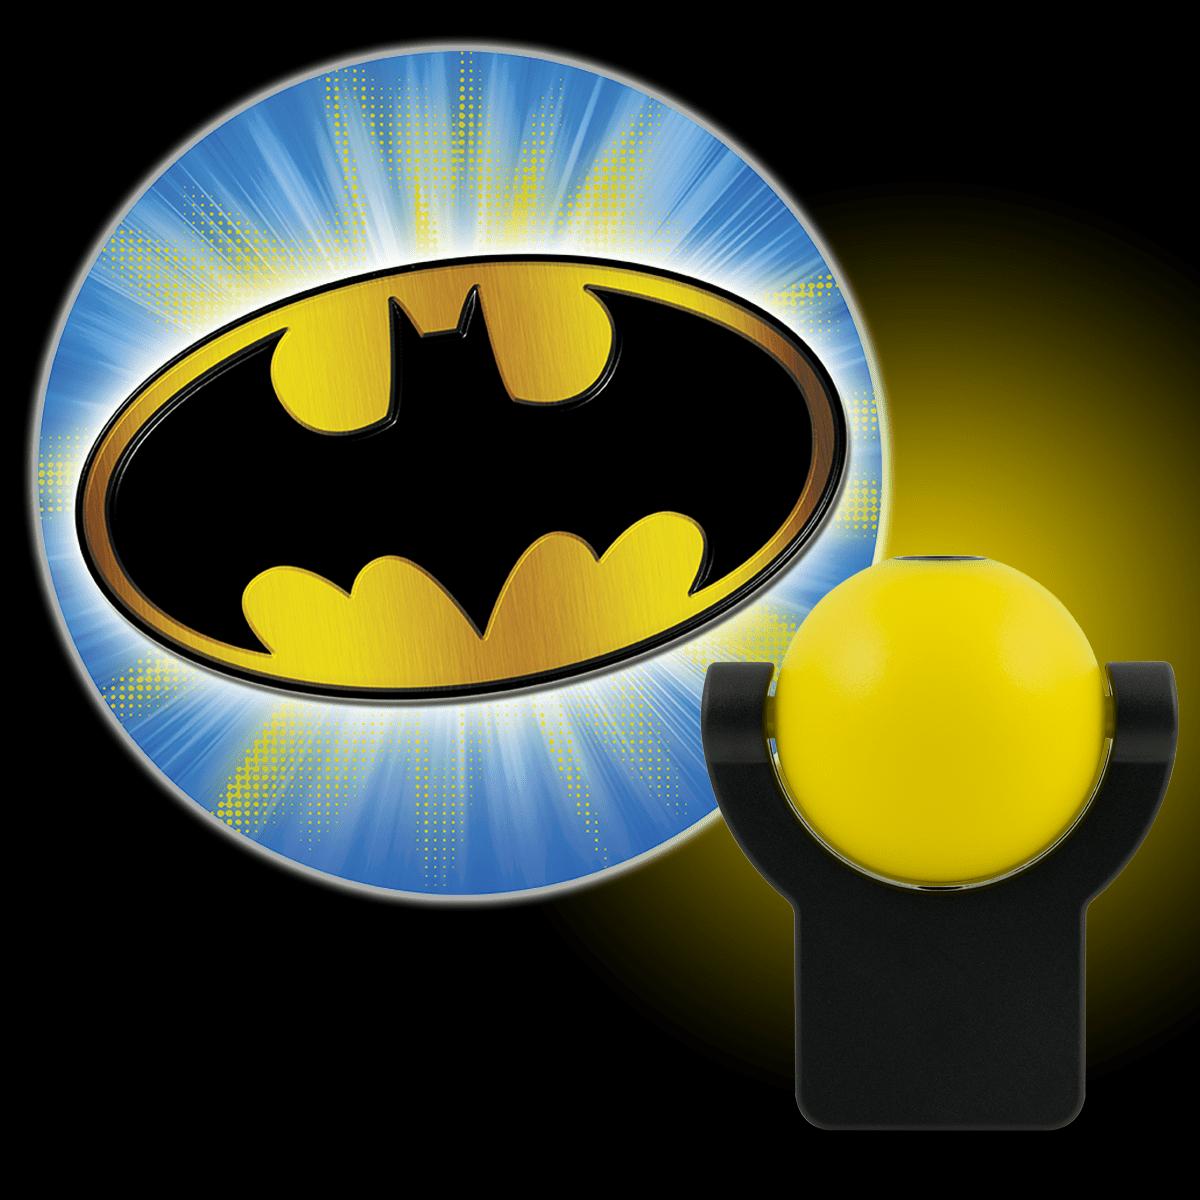 Projectables DC Comics Batman LED Plug-In Night Light, Bat Signal, 14536 by Jasco Products Company, LLC